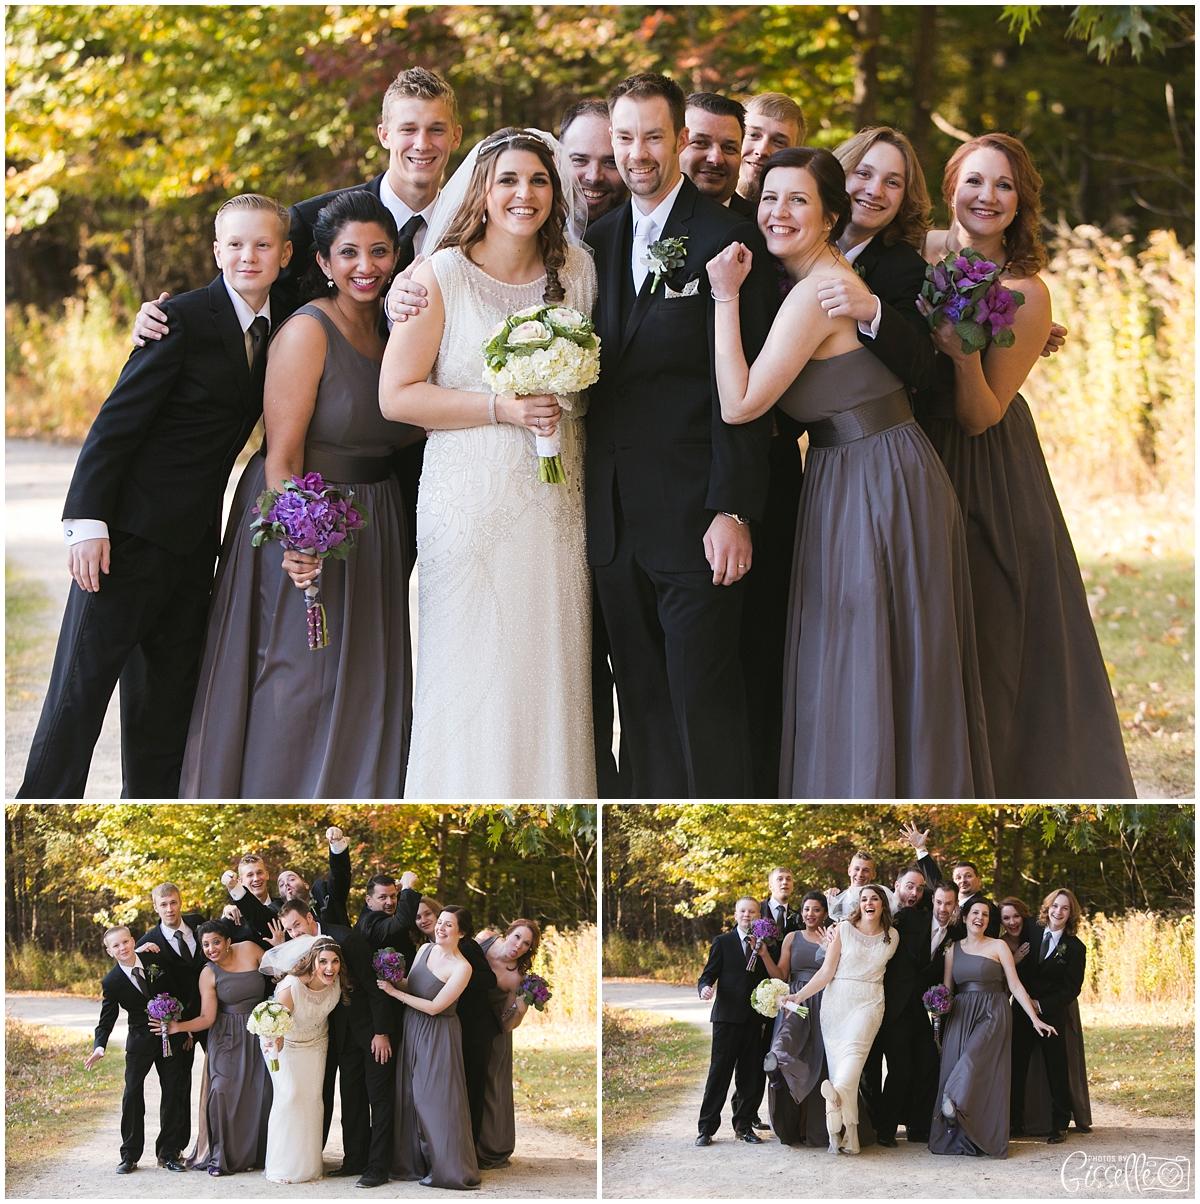 Fall-Chicagoland-Wedding_0014.jpg